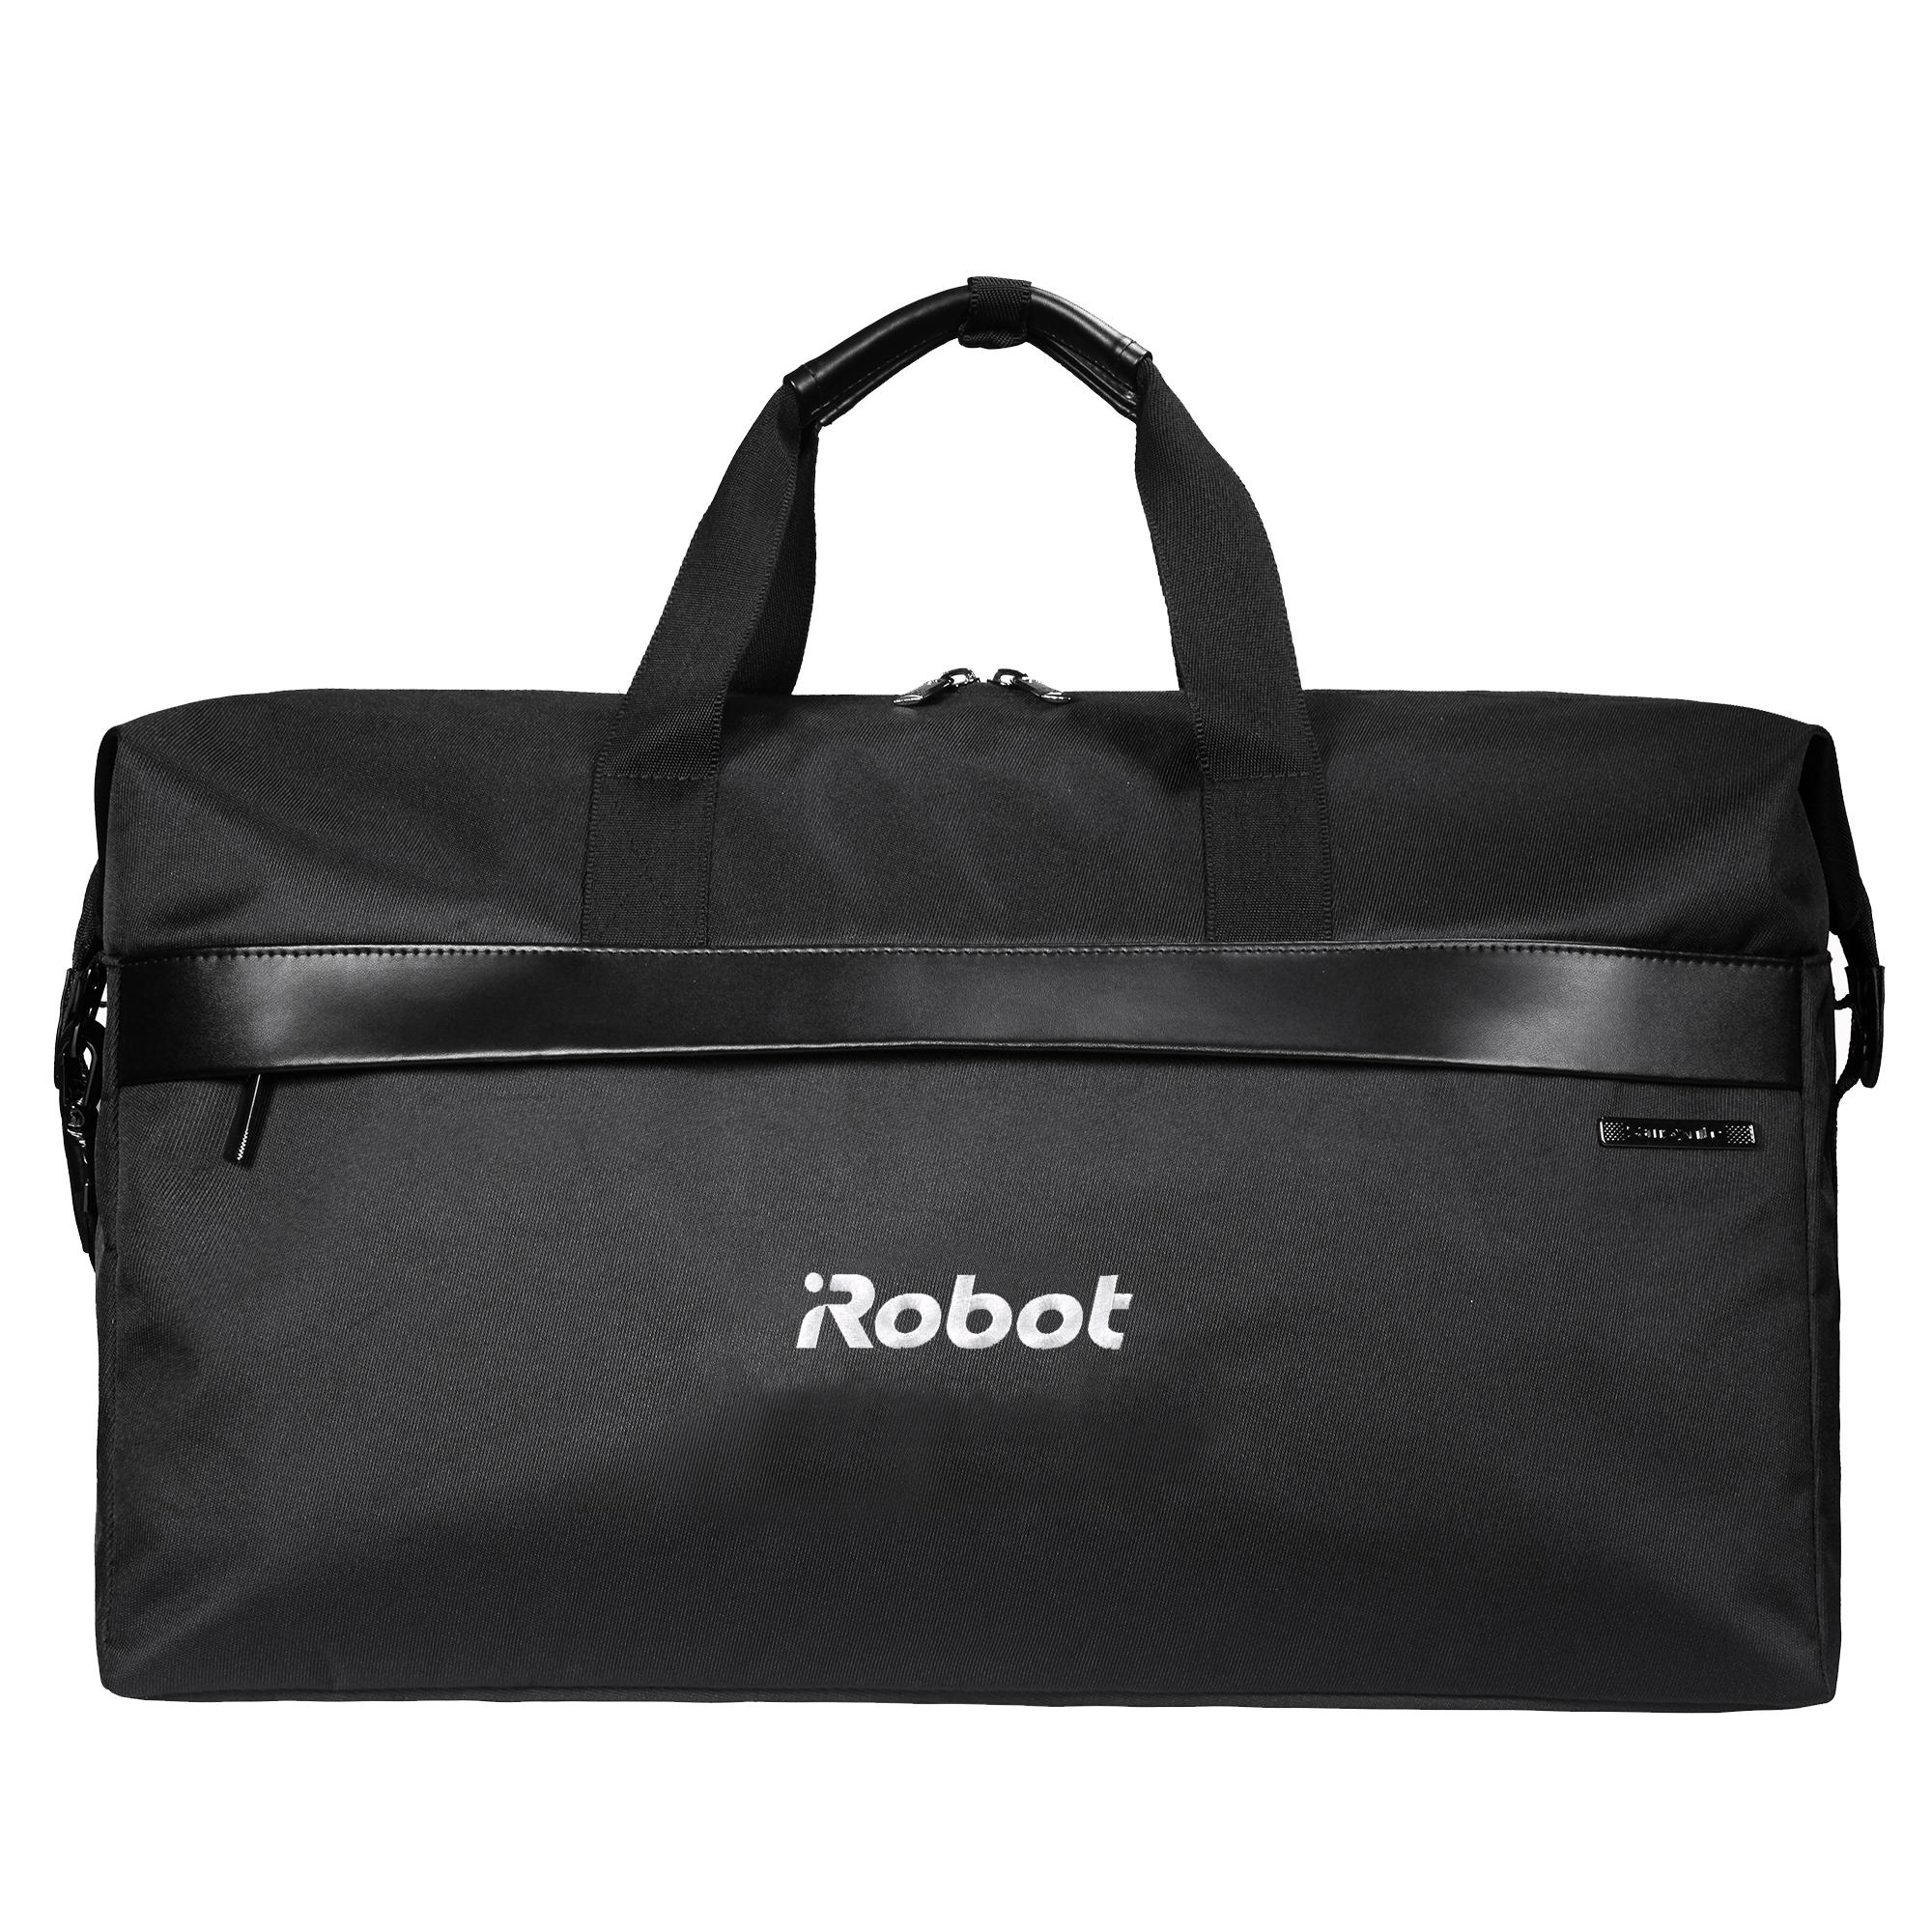 Custom Samsonite Executive Travel Bag